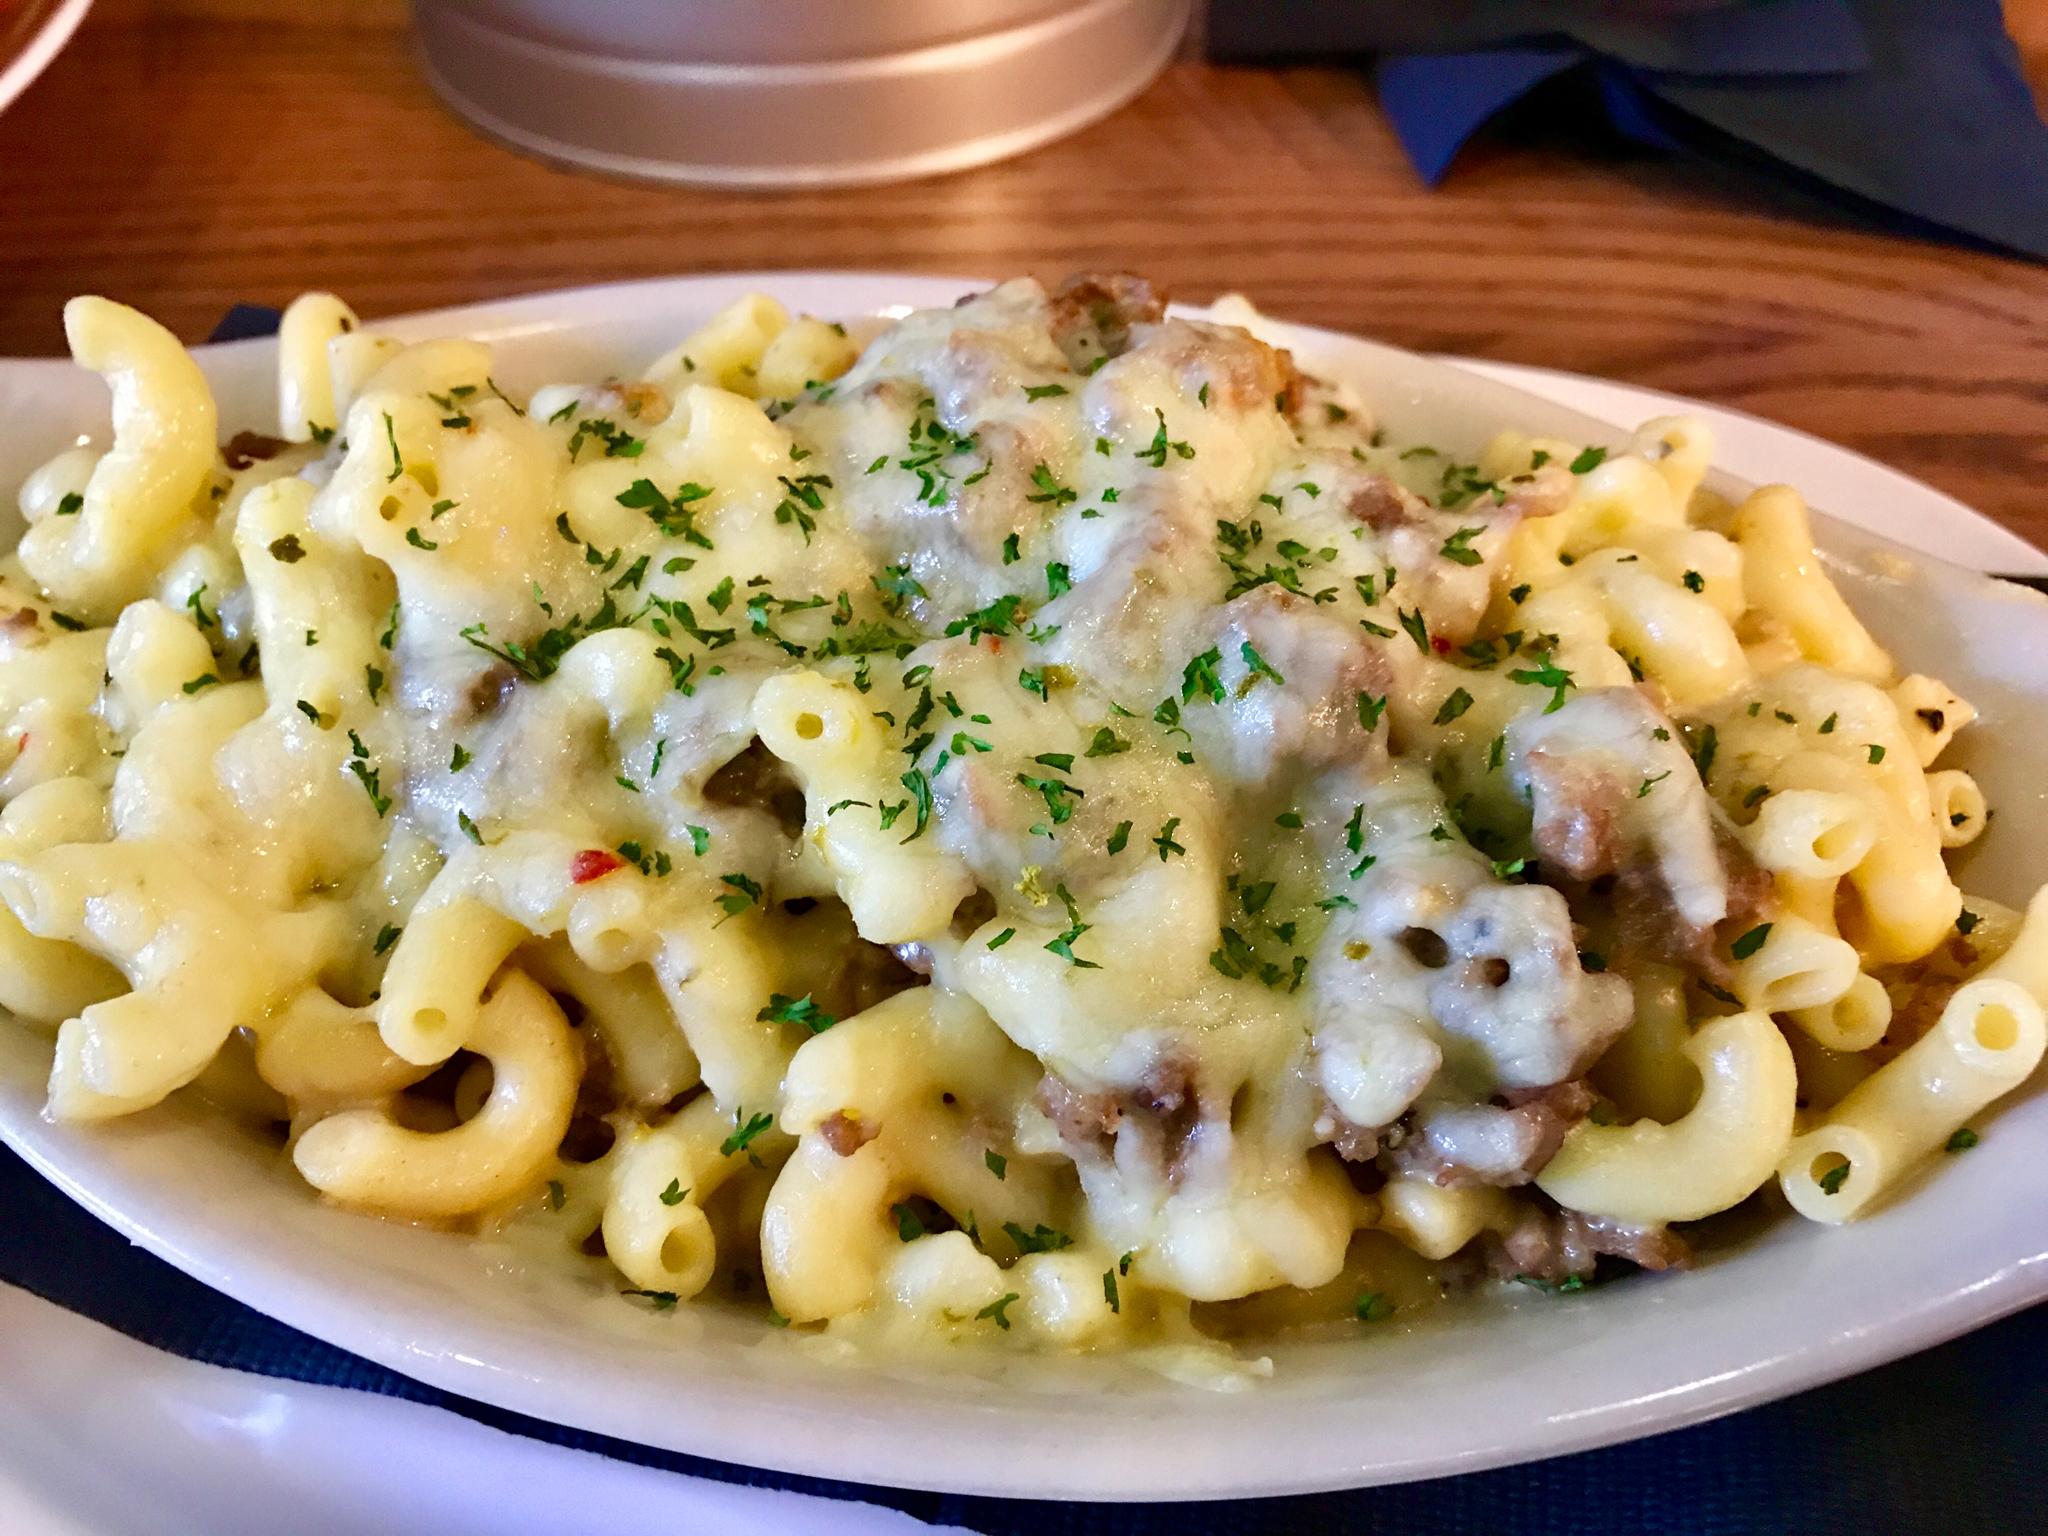 Philly Steak Mac & Cheese